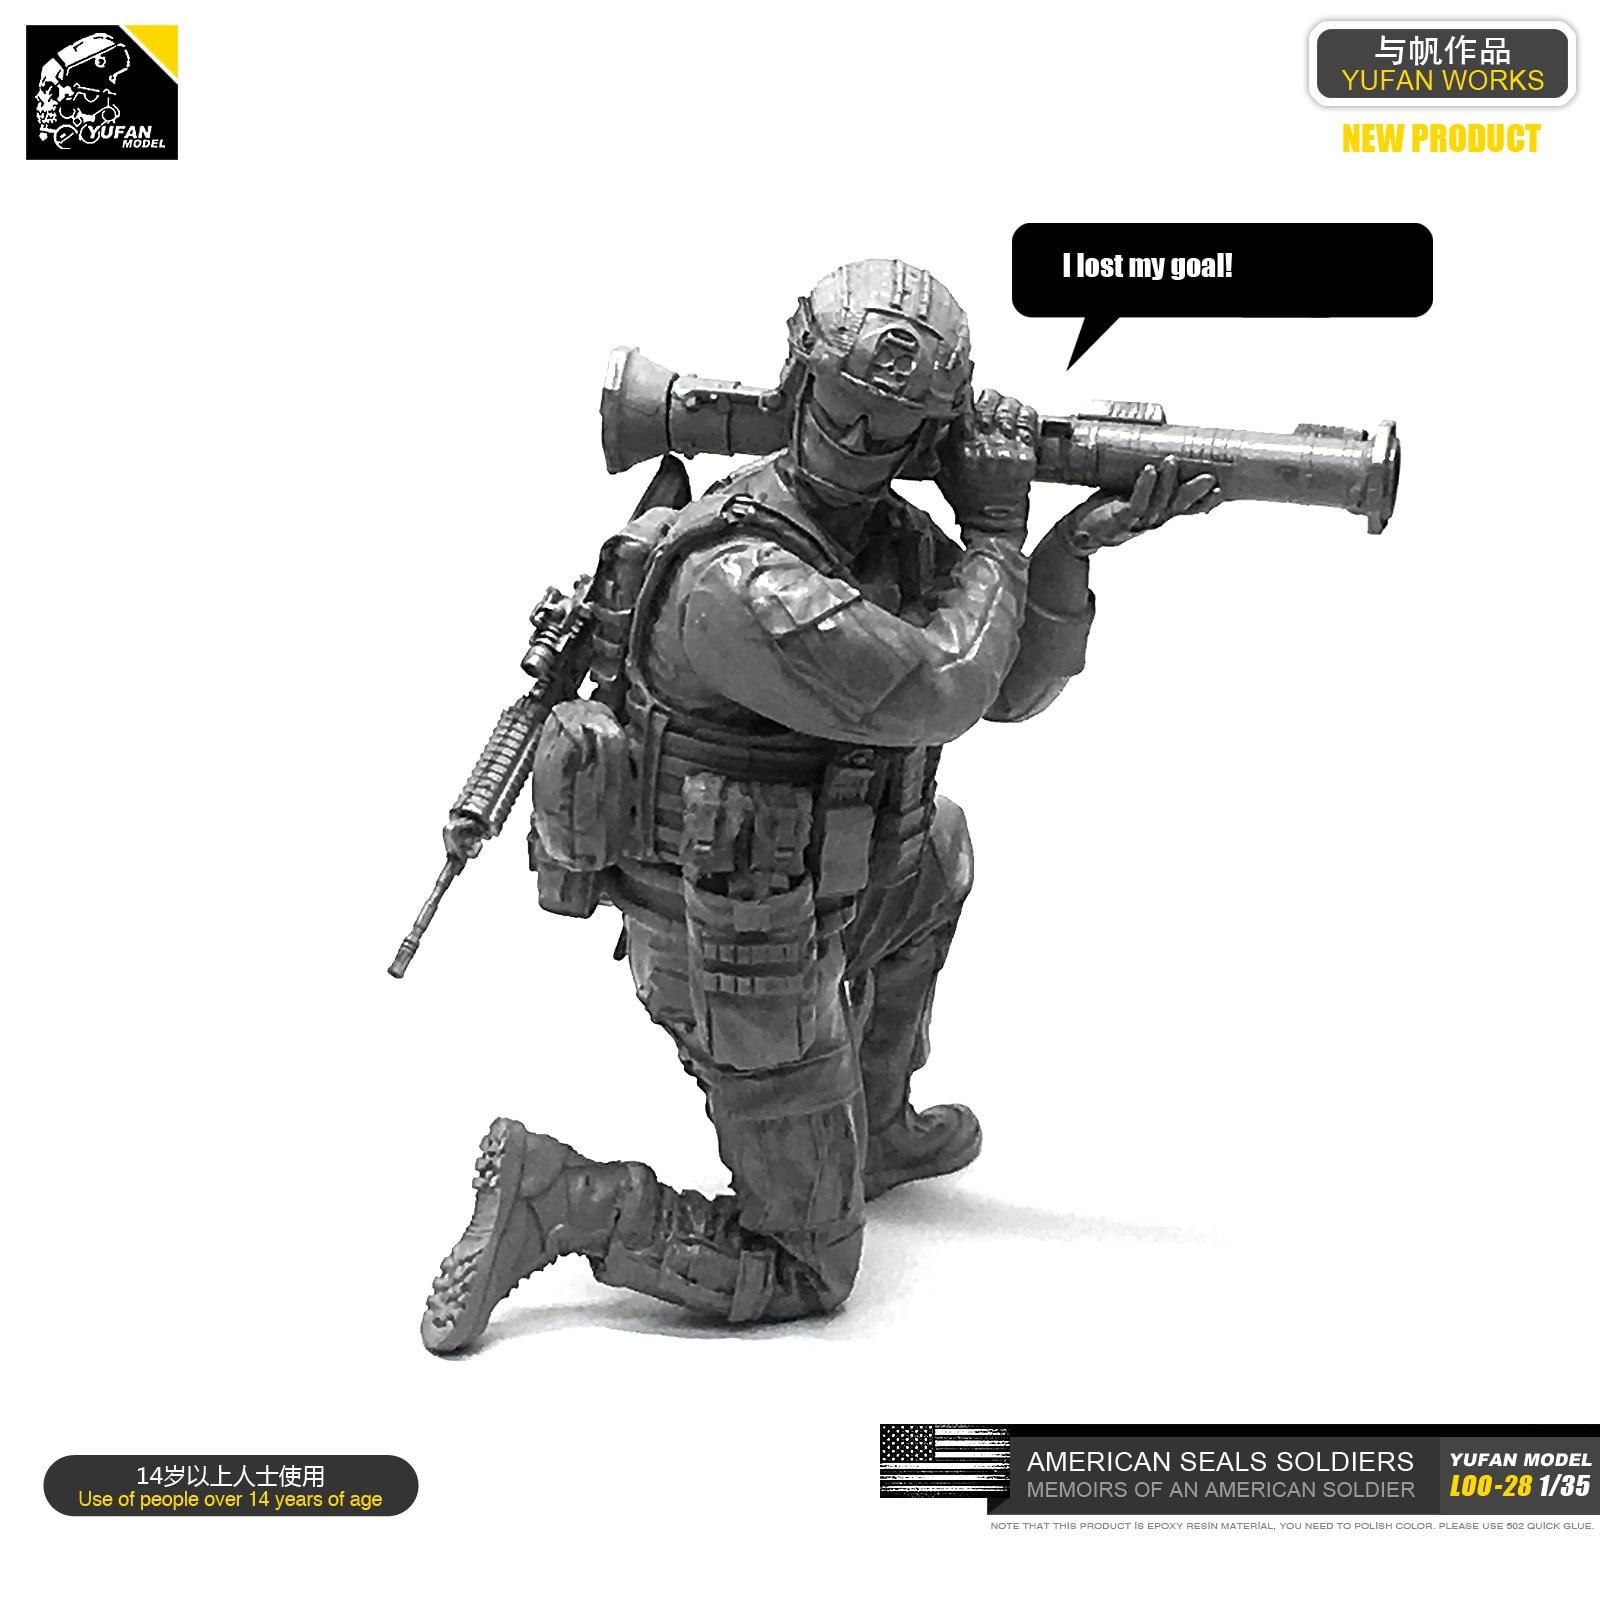 1/35 Resina Kits SEAL Da Marinha dos EUA anti-armadura resina soldado self-assembled LOO-28